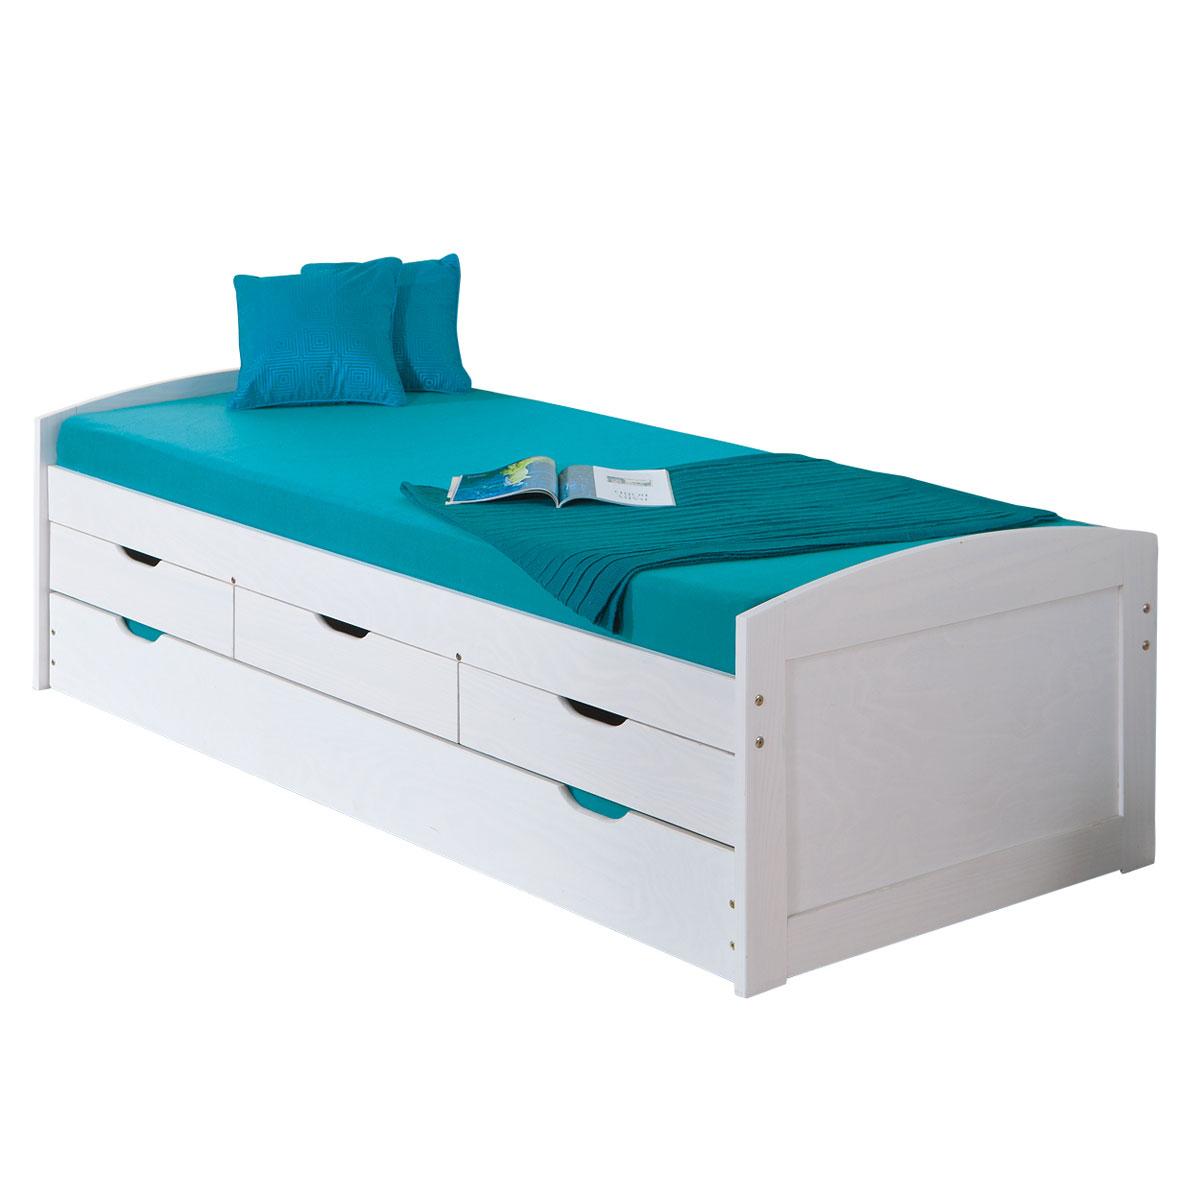 Full Size of Bett Ohne Füße 200x200 Komforthöhe Topper Leander Landhaus Rundes Antik Im Schrank Kingsize 120 X 200 Bett Bett 190x90